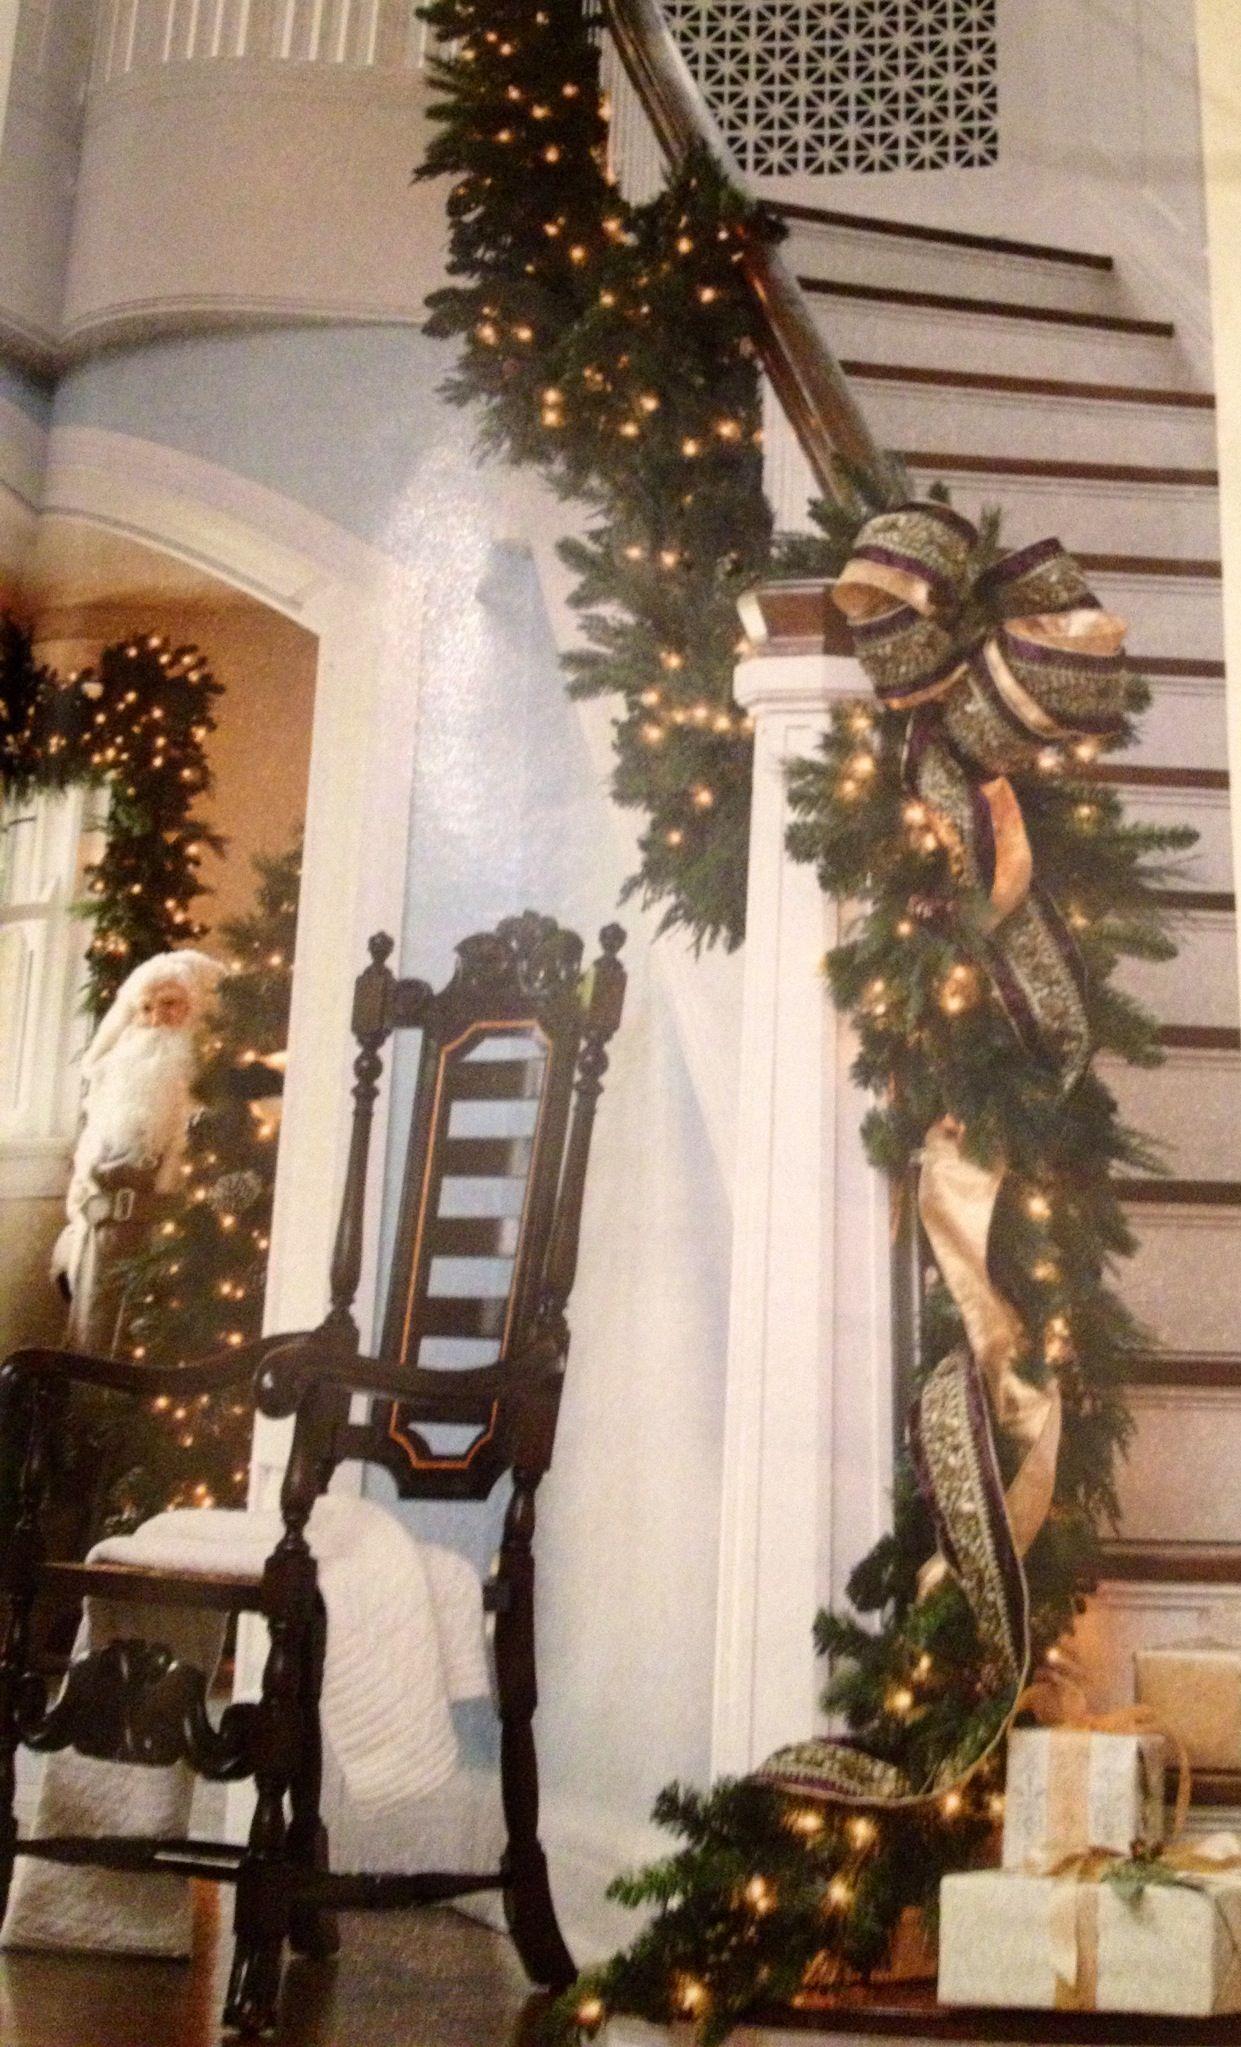 Christmas Staircase Idea Via Frontgate Christmas Garland